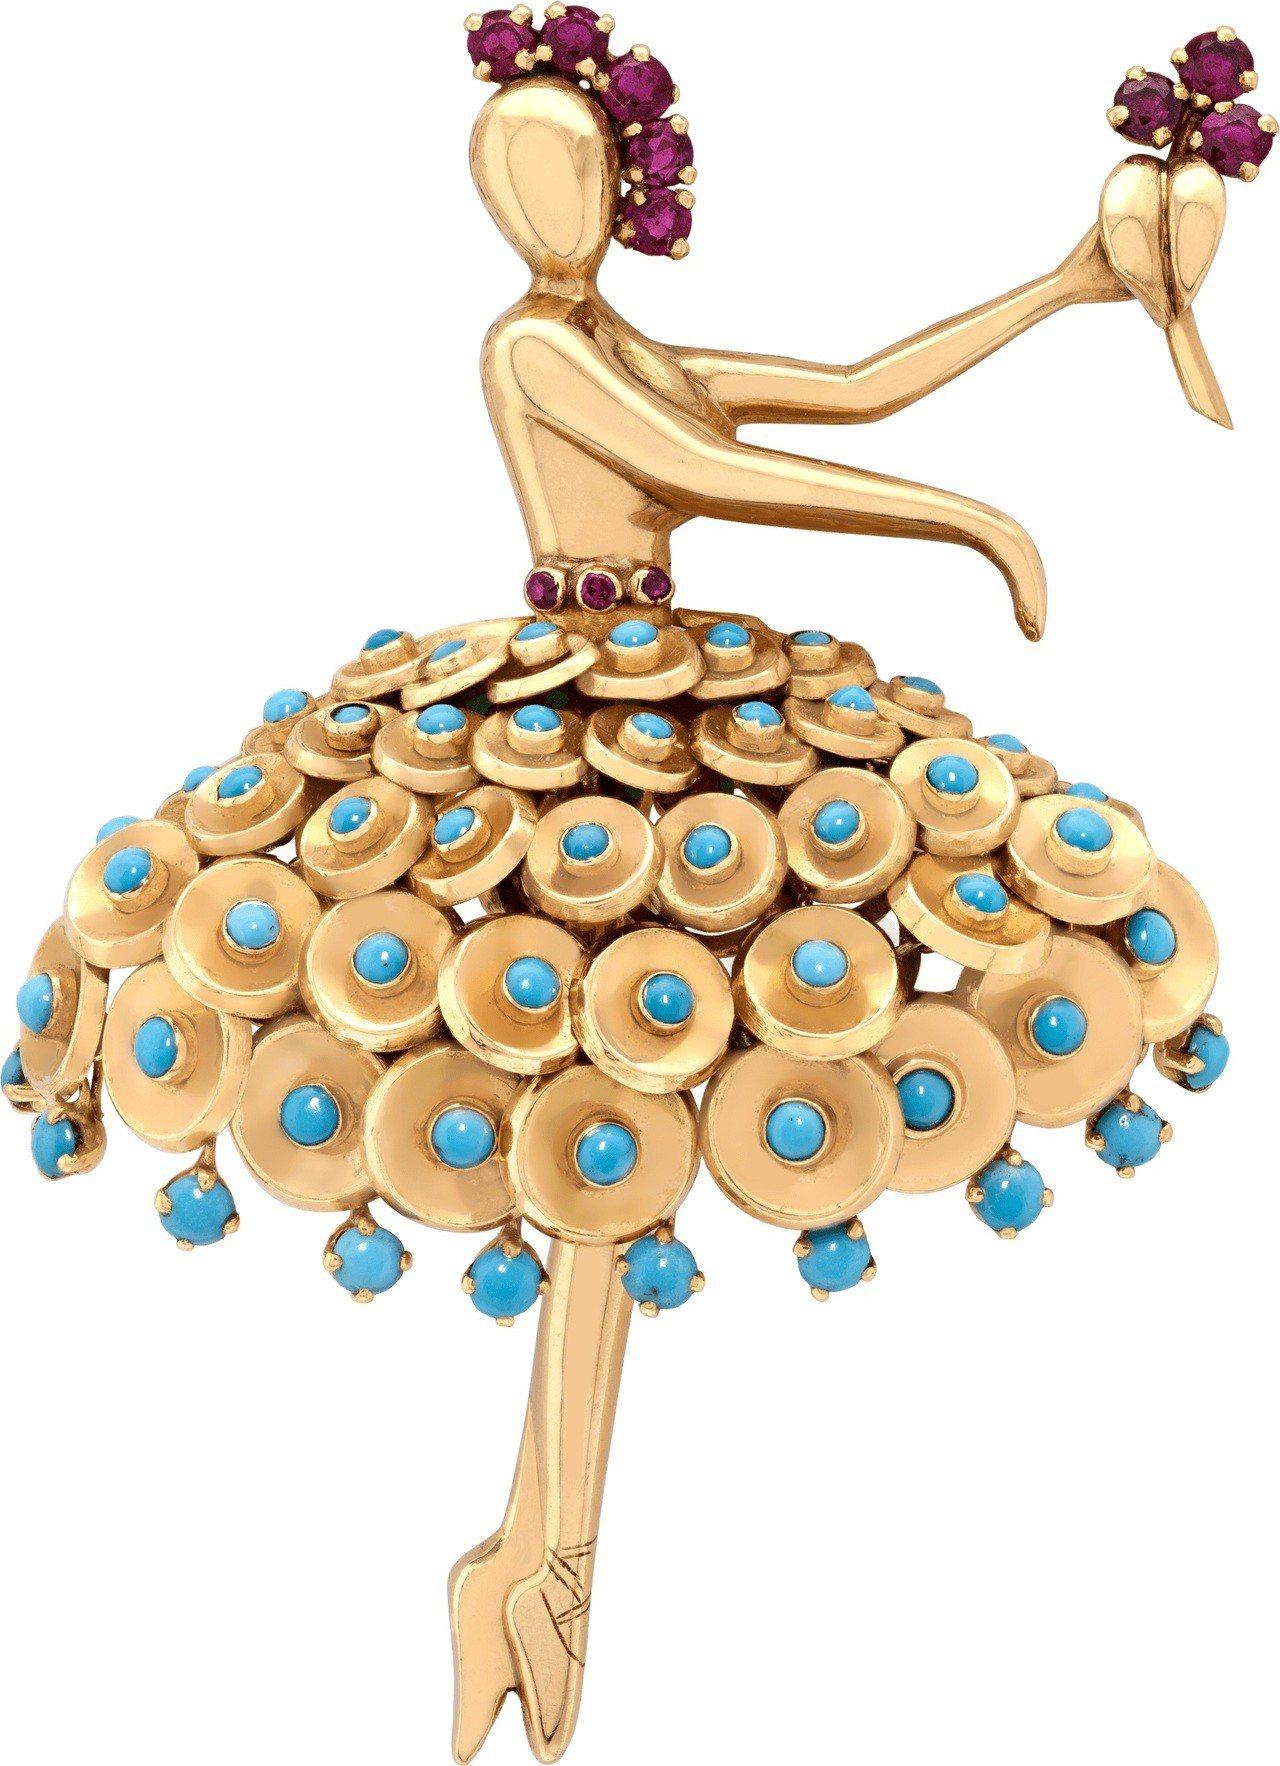 Danseuse Paillettes胸針 1955年作品,黃K金、玫瑰金、白K...